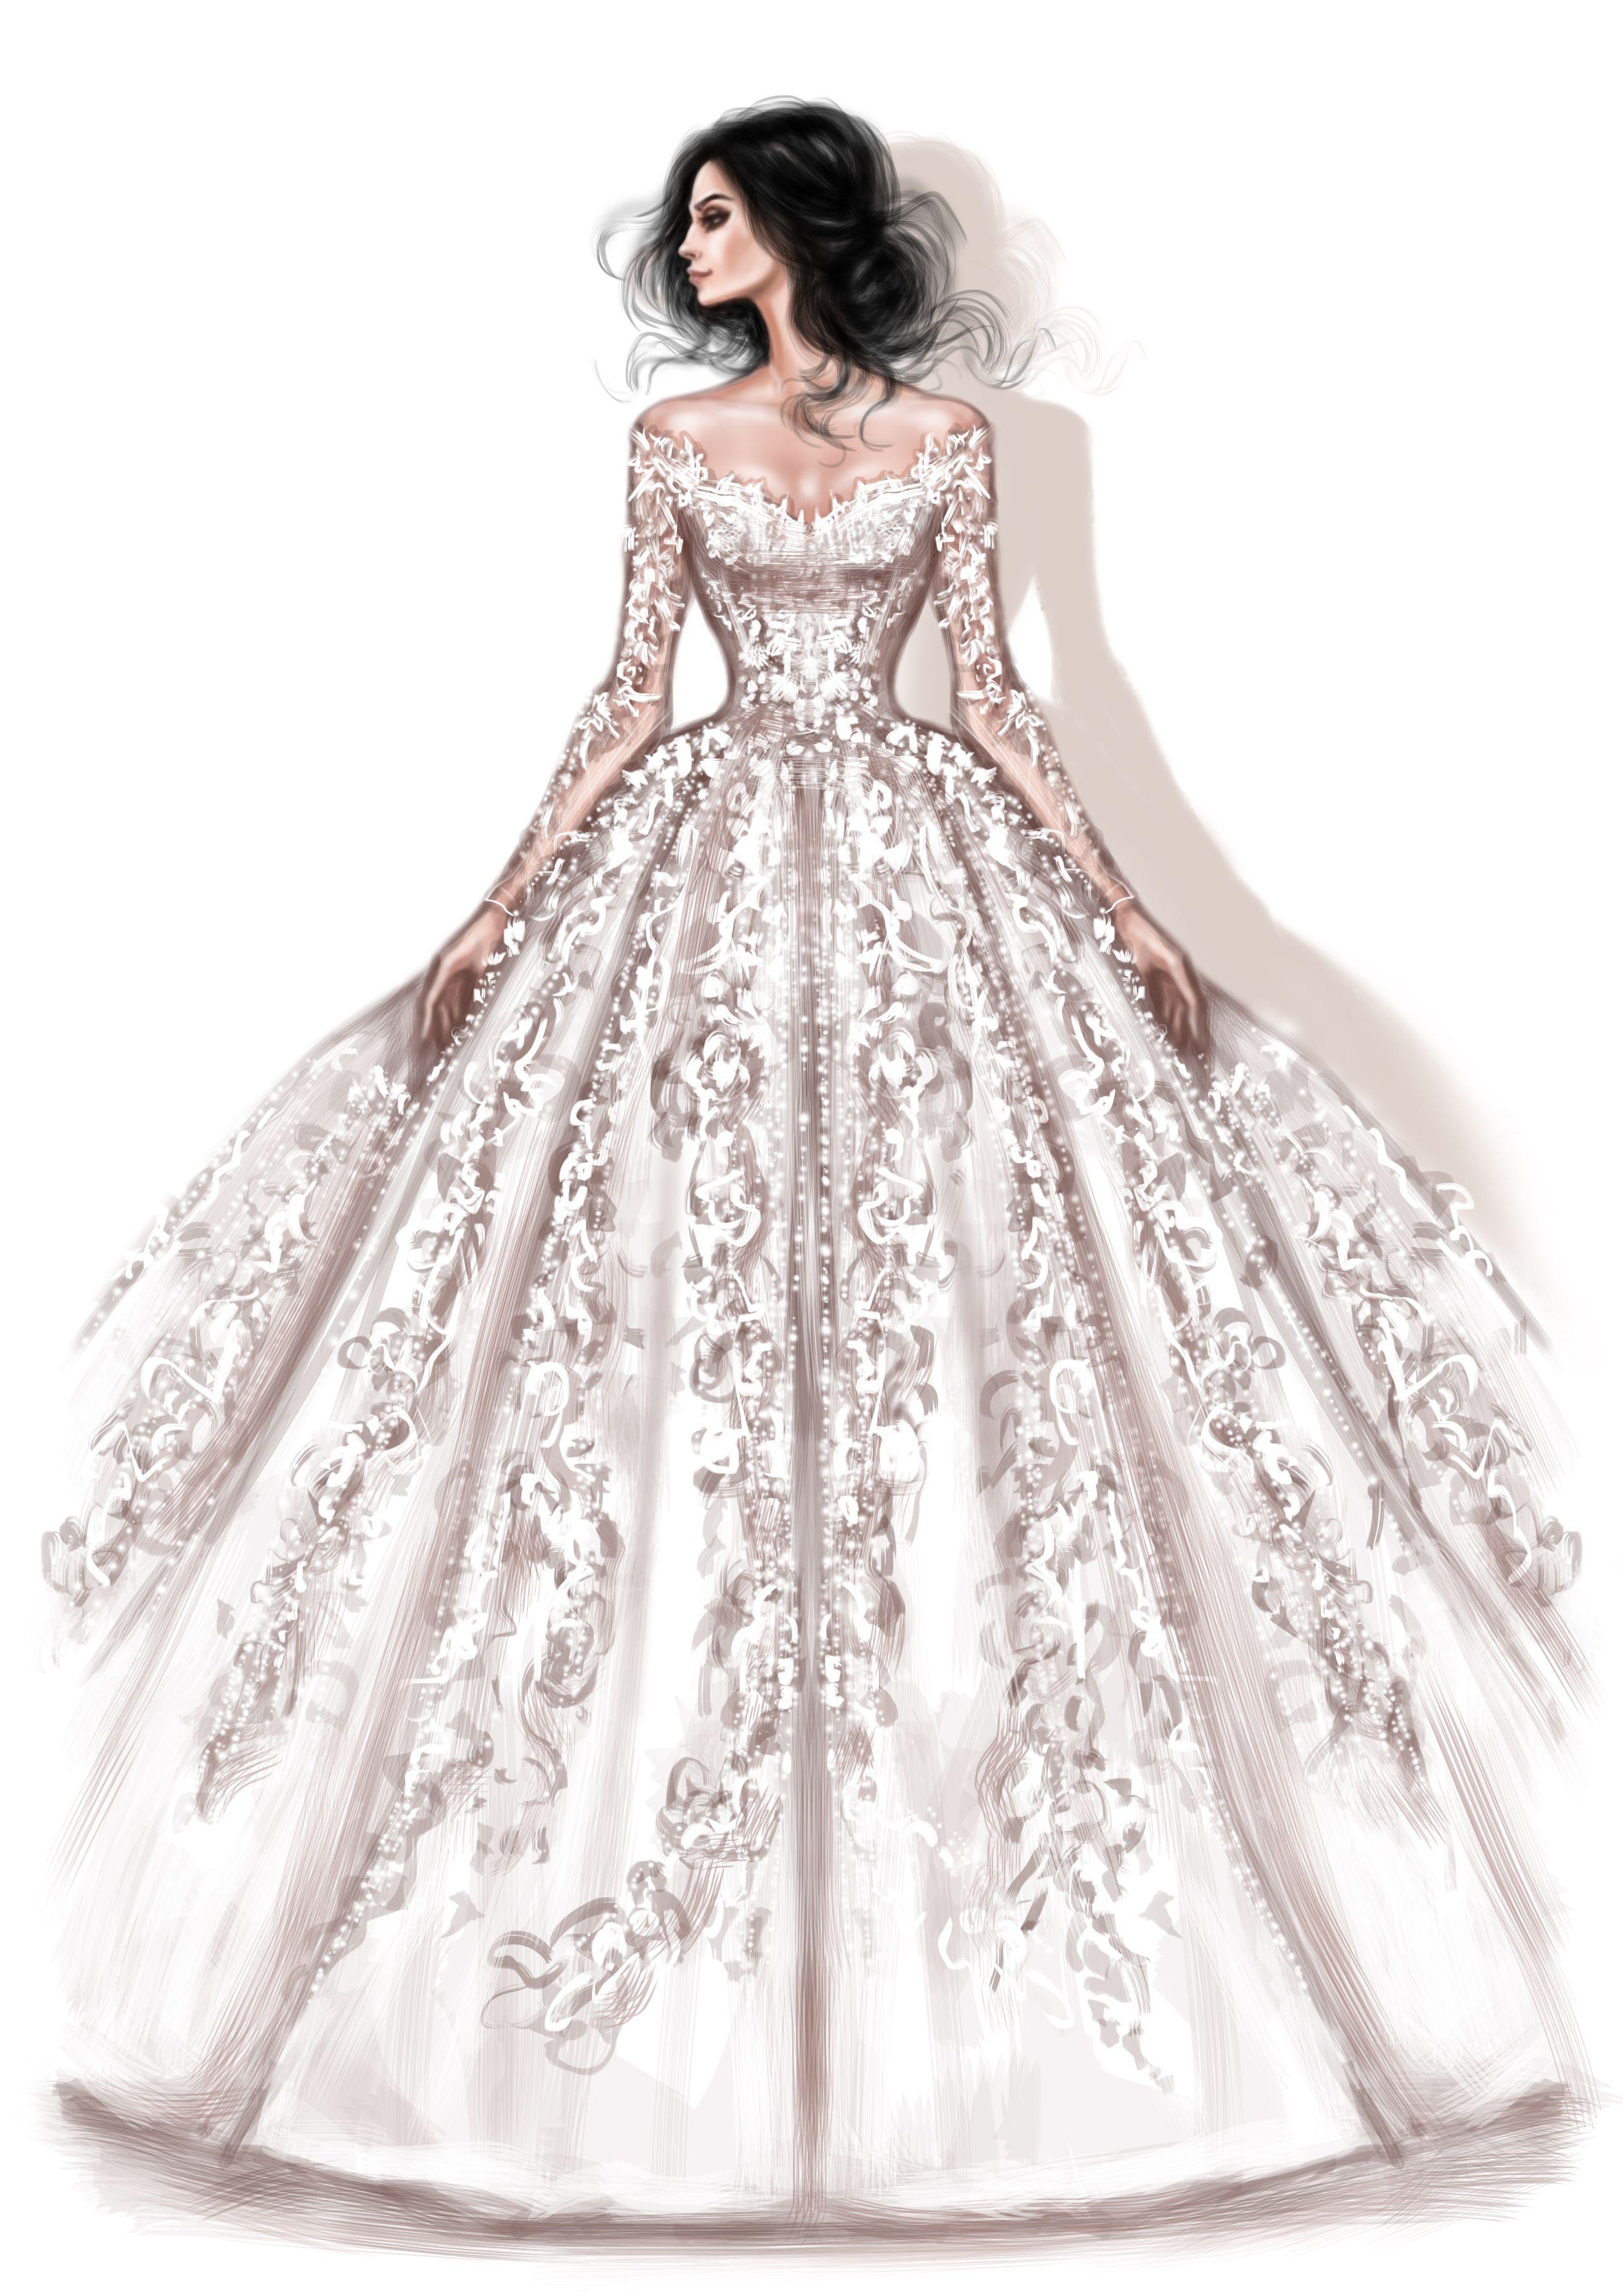 Beautiful Illustrations Of Rami Al Ali Bridal Collection Created By Shamekh Bluwi Il Fashion Illustration Dresses Dress Design Sketches Dress Design Drawing